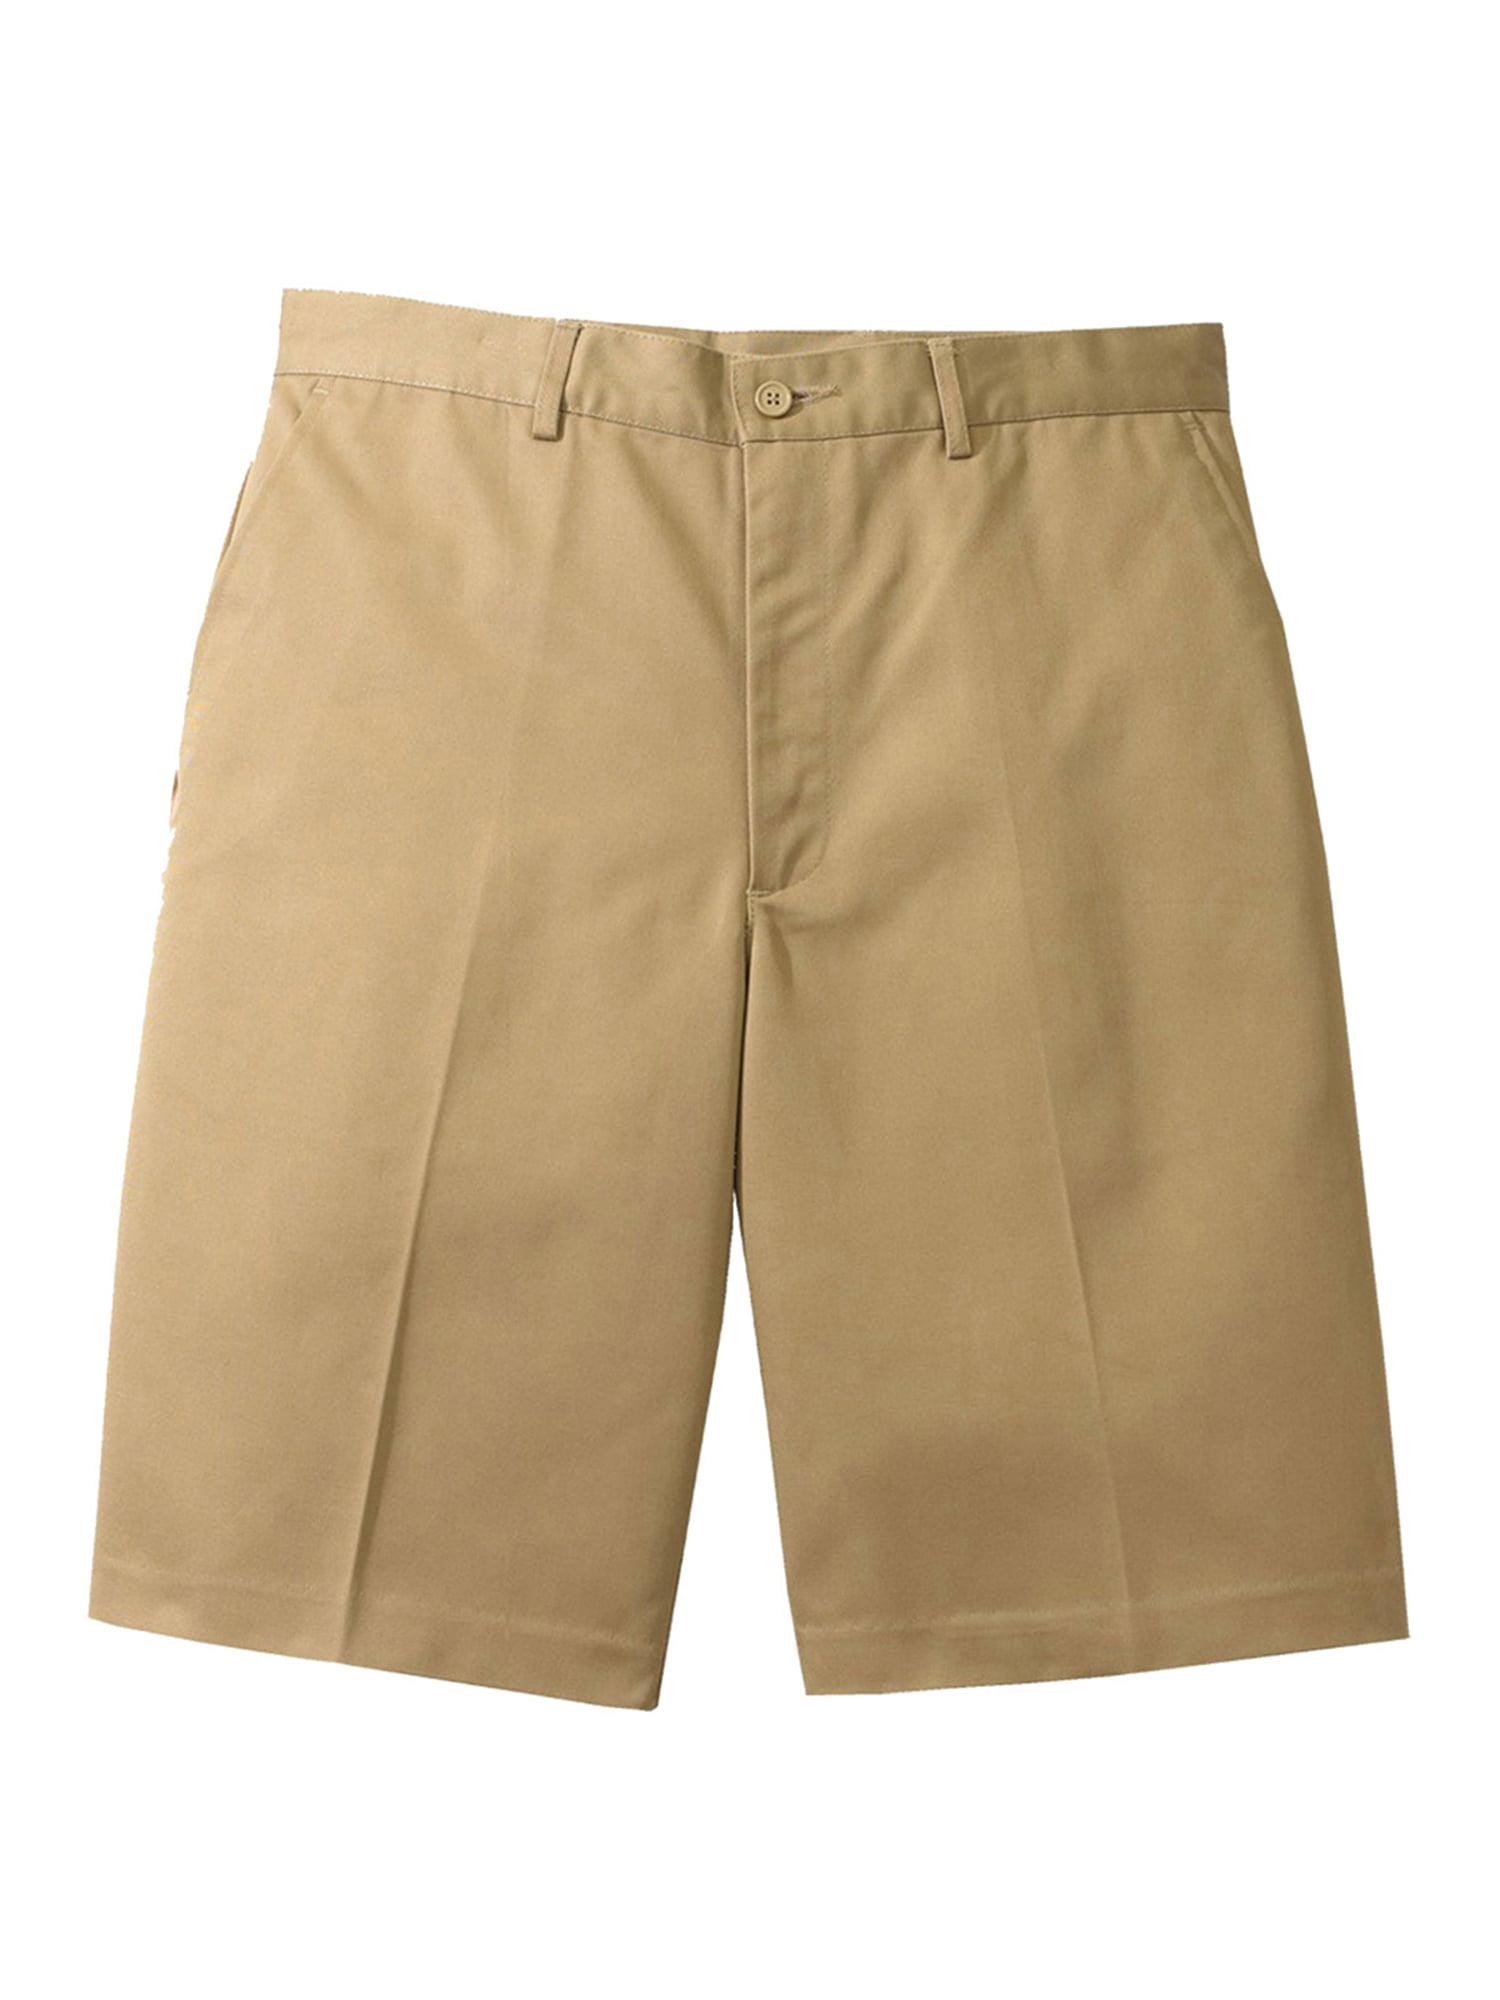 Ed Garments Men's Flat Front Casual Chino Blend Short, TAN, 30